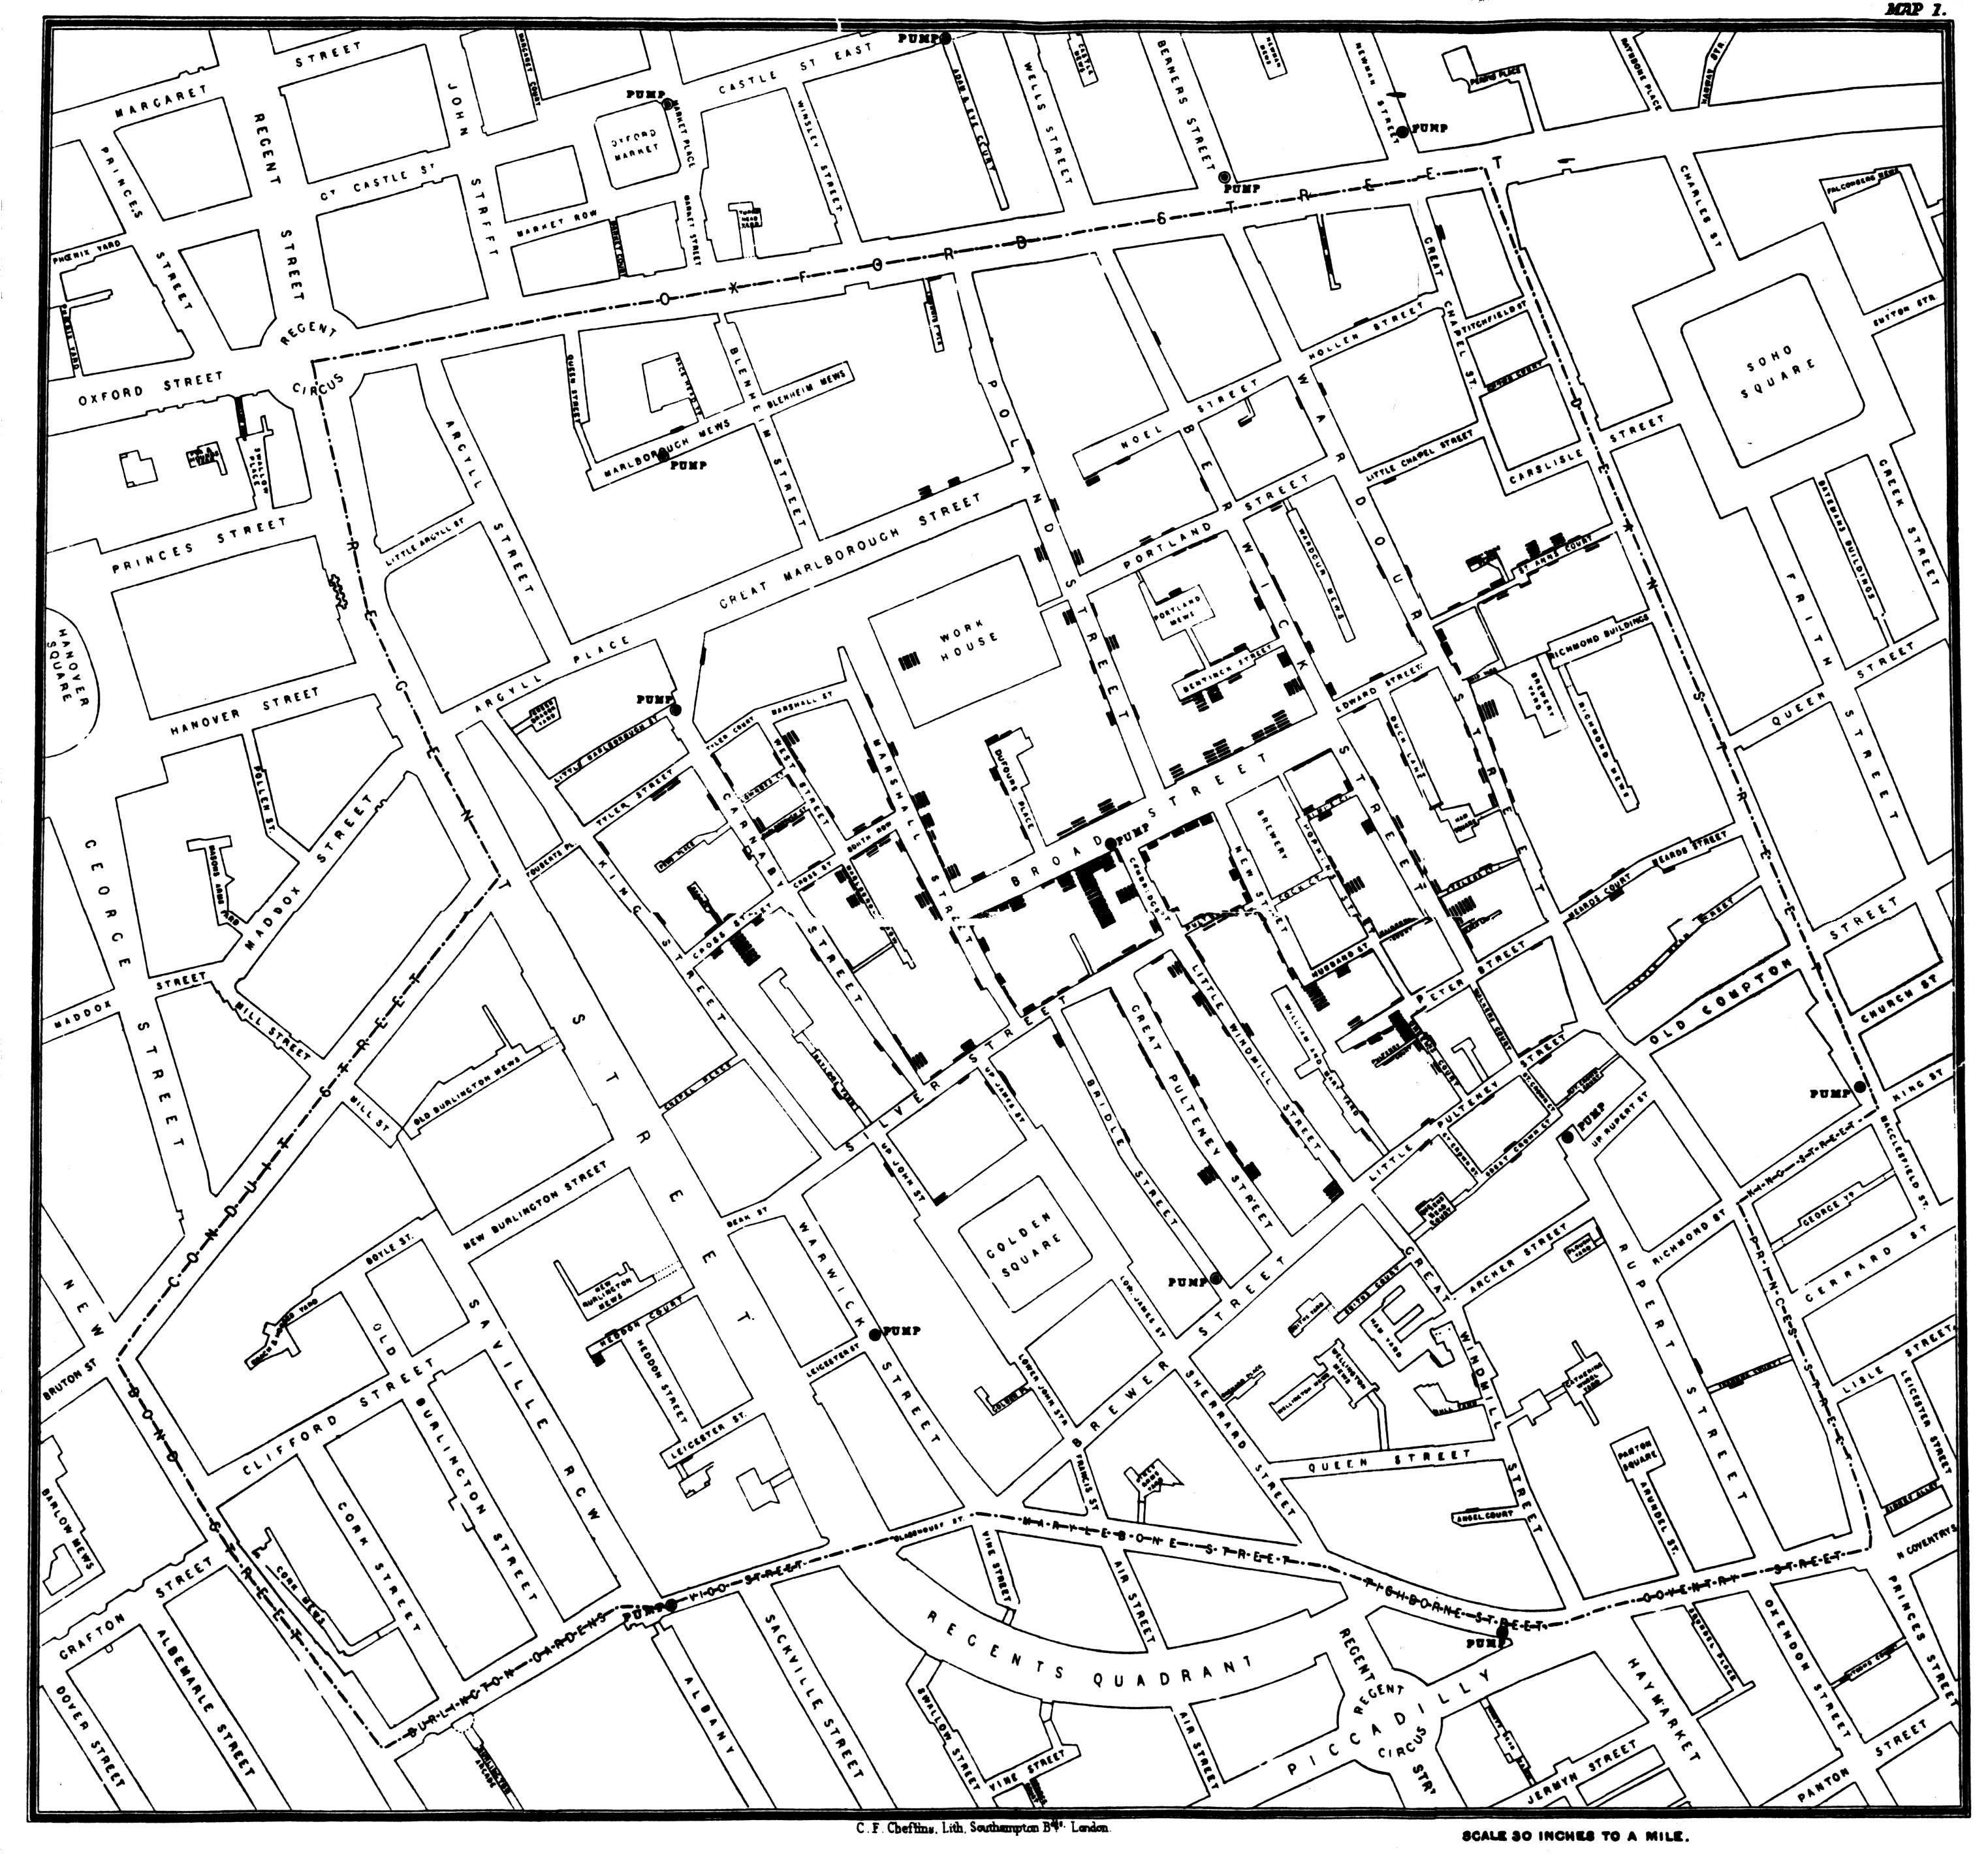 3045x2840 John Snow's Famous Cholera Map. Original Map By John Snow Showing